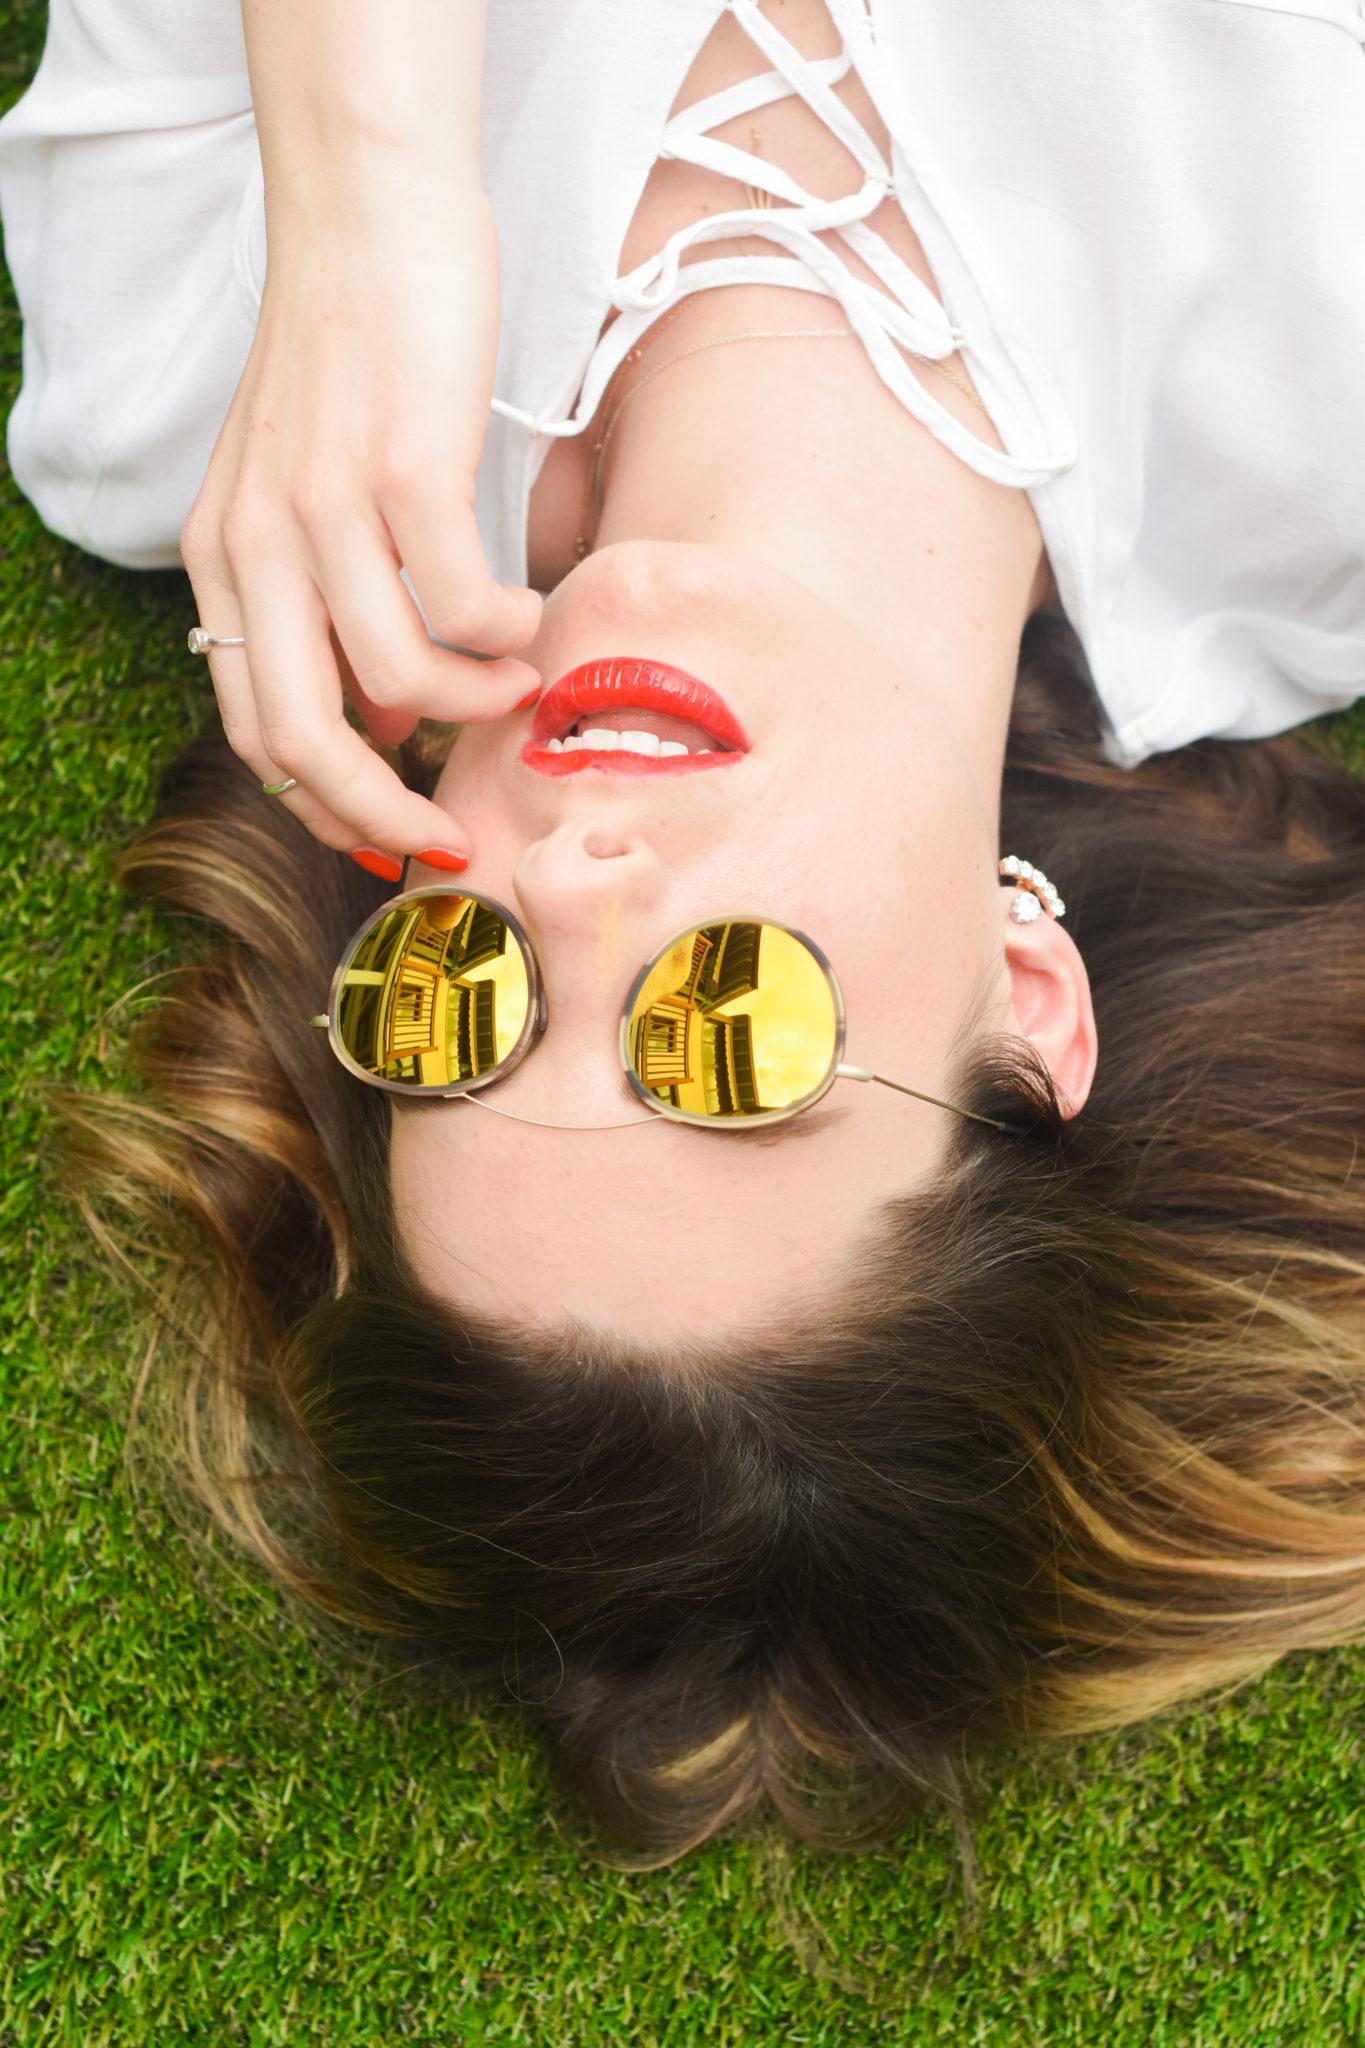 giulia de martin spektre sunglasses eyewear behindmyglasses.com mirror lenses metro 2 flat met-ro sunnies -22